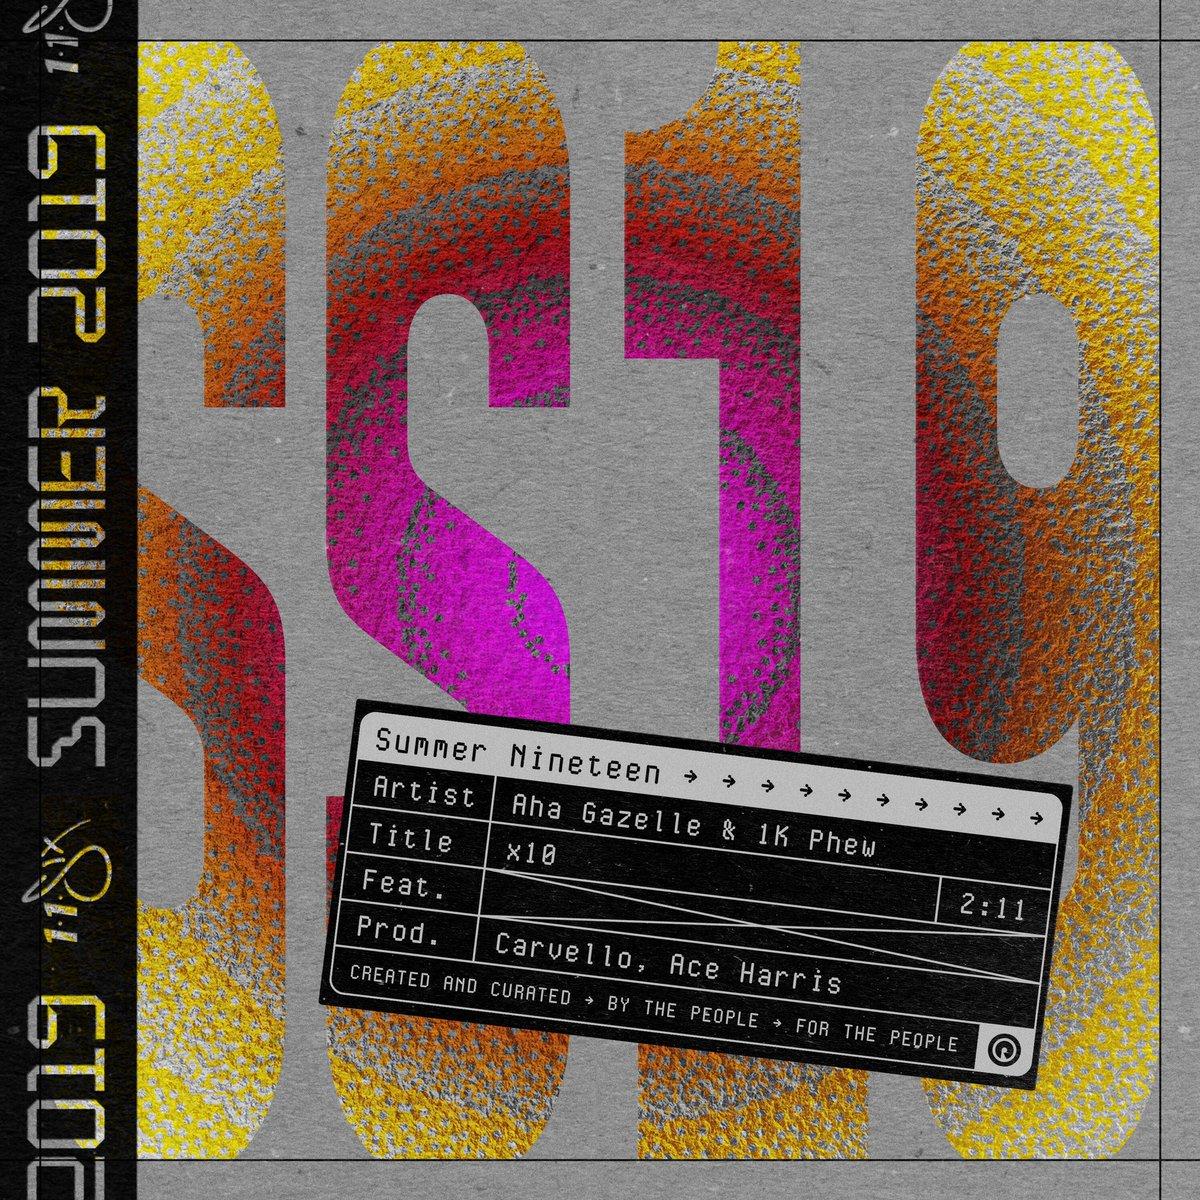 Reach Records Summer Nineteen